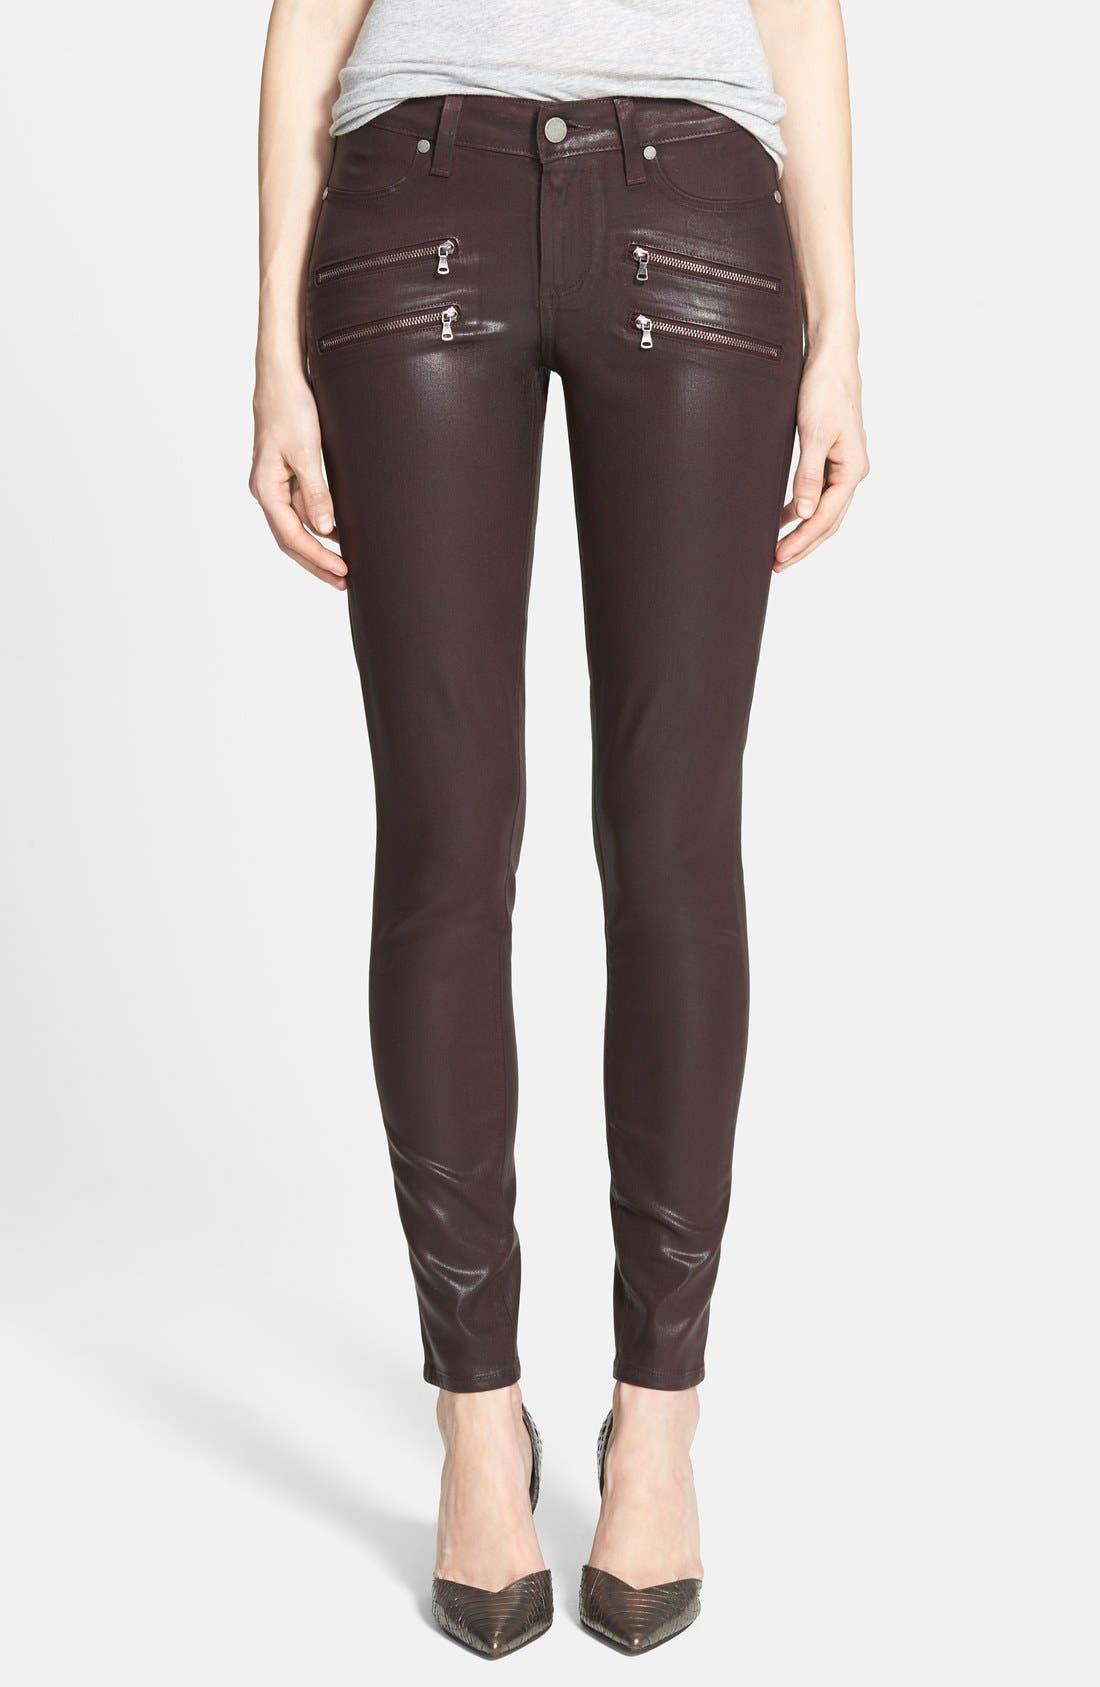 Denim 'Edgemont' Coated Skinny Jeans,                         Main,                         color, Dark Mauve Pink